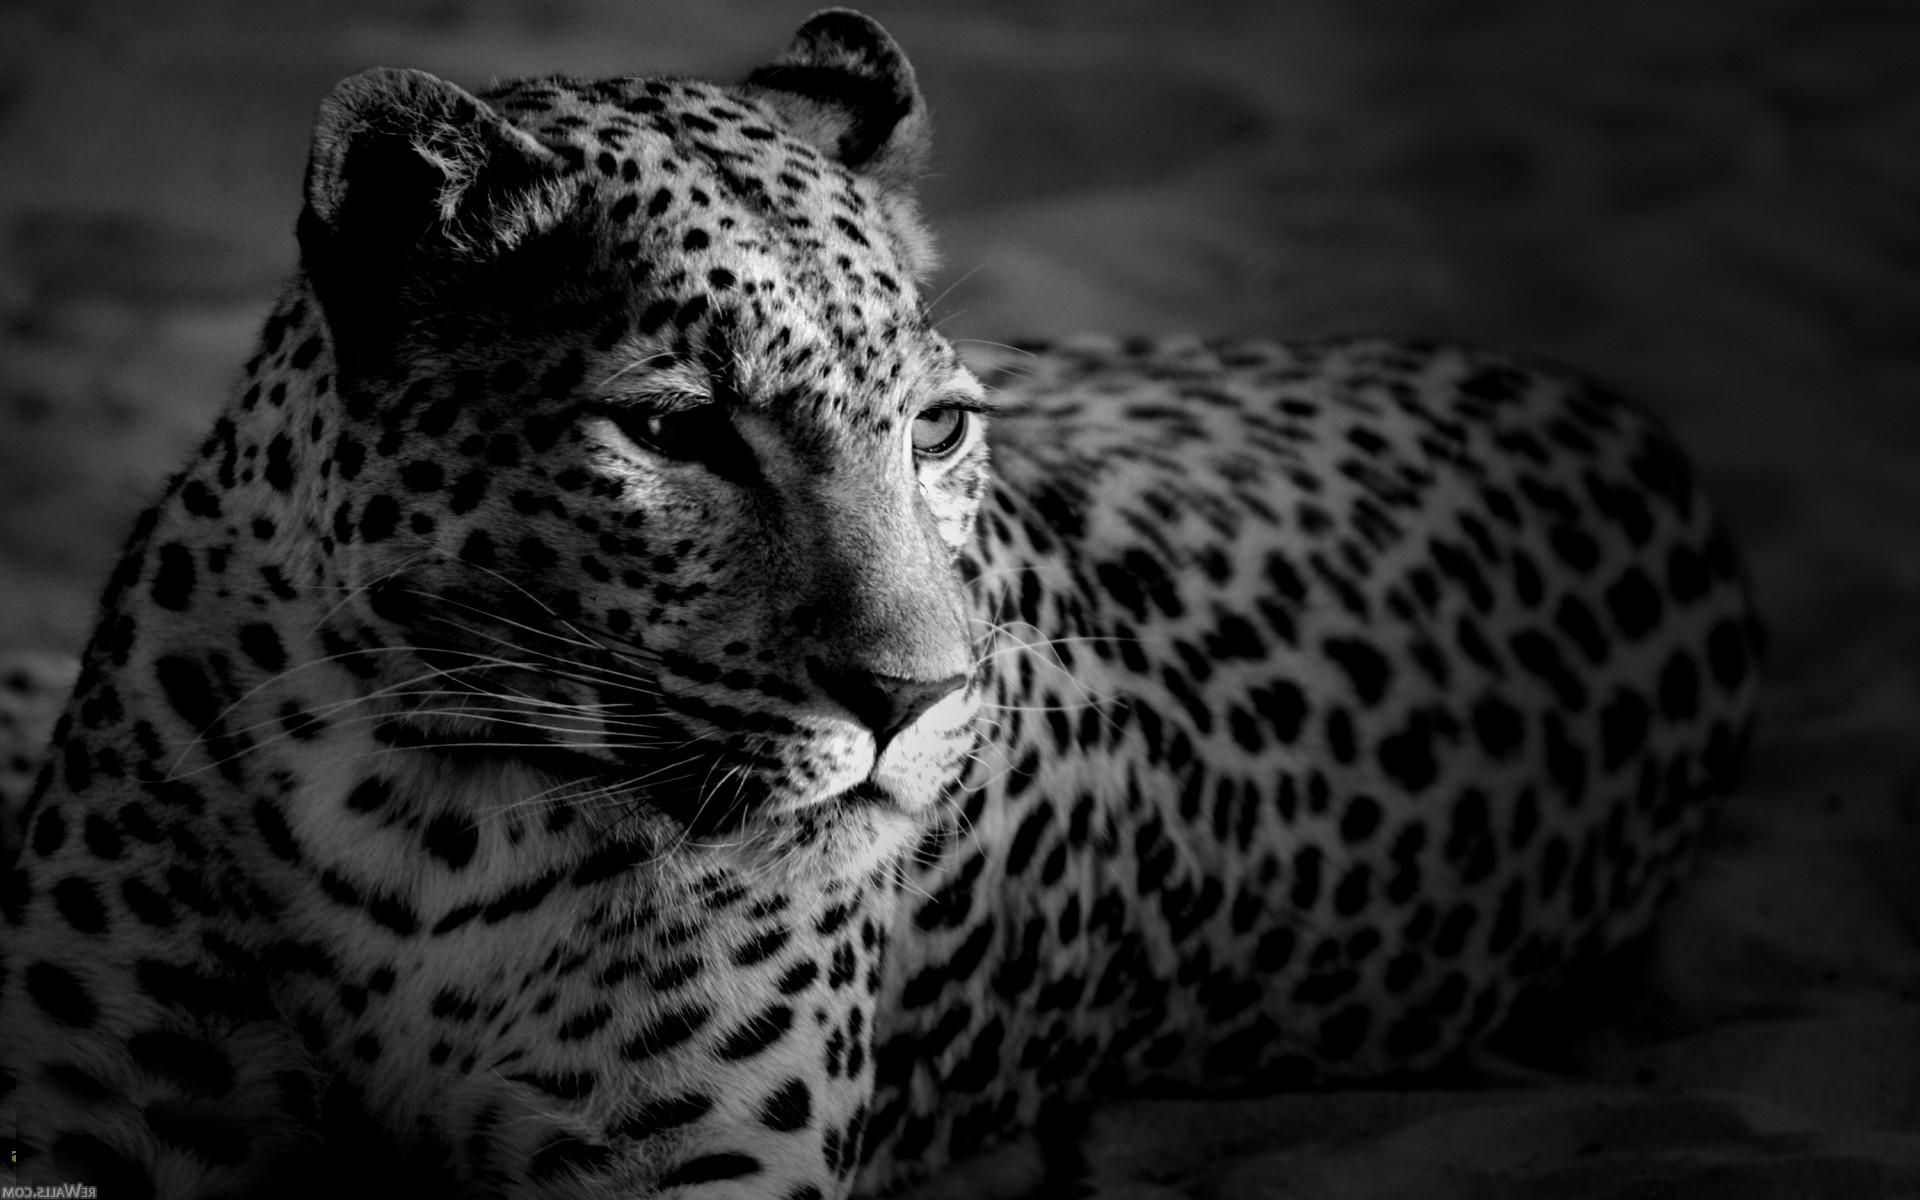 Big cats whiskers jaguar cheetah cheetahs jaguars snow leopard fauna 1920x1200 px computer wallpaper black and white monochrome photography